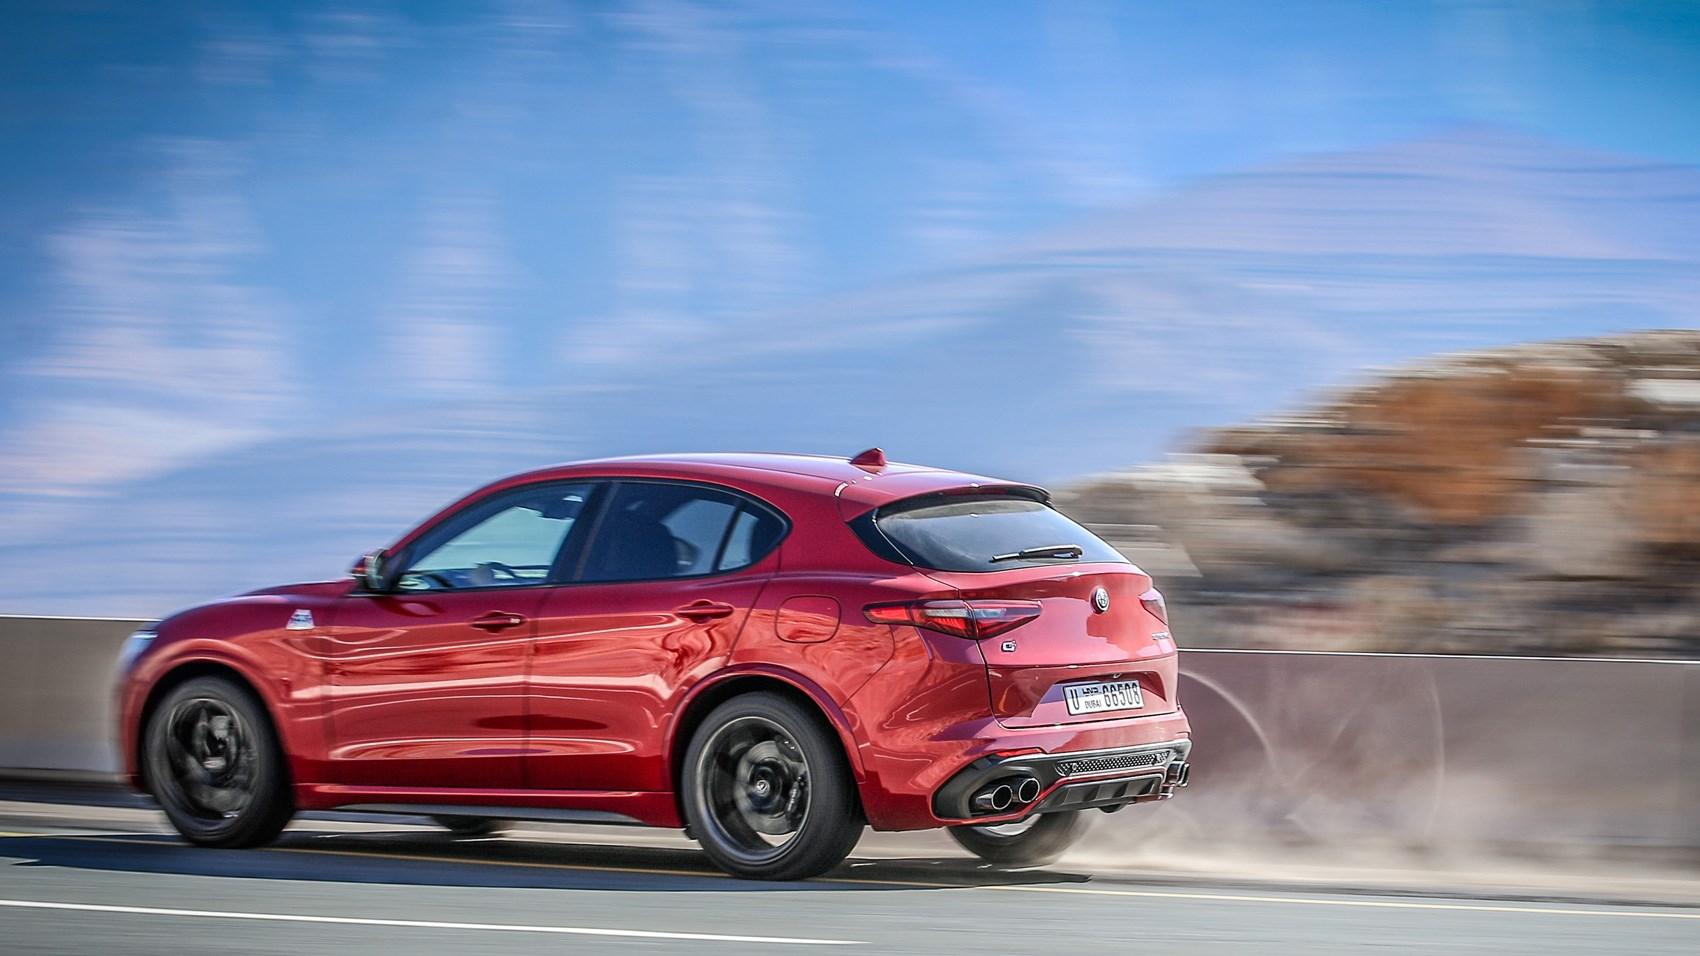 Alfa Romeo Stelvio Qf 2018 Review A Match For A Macan Car Magazine